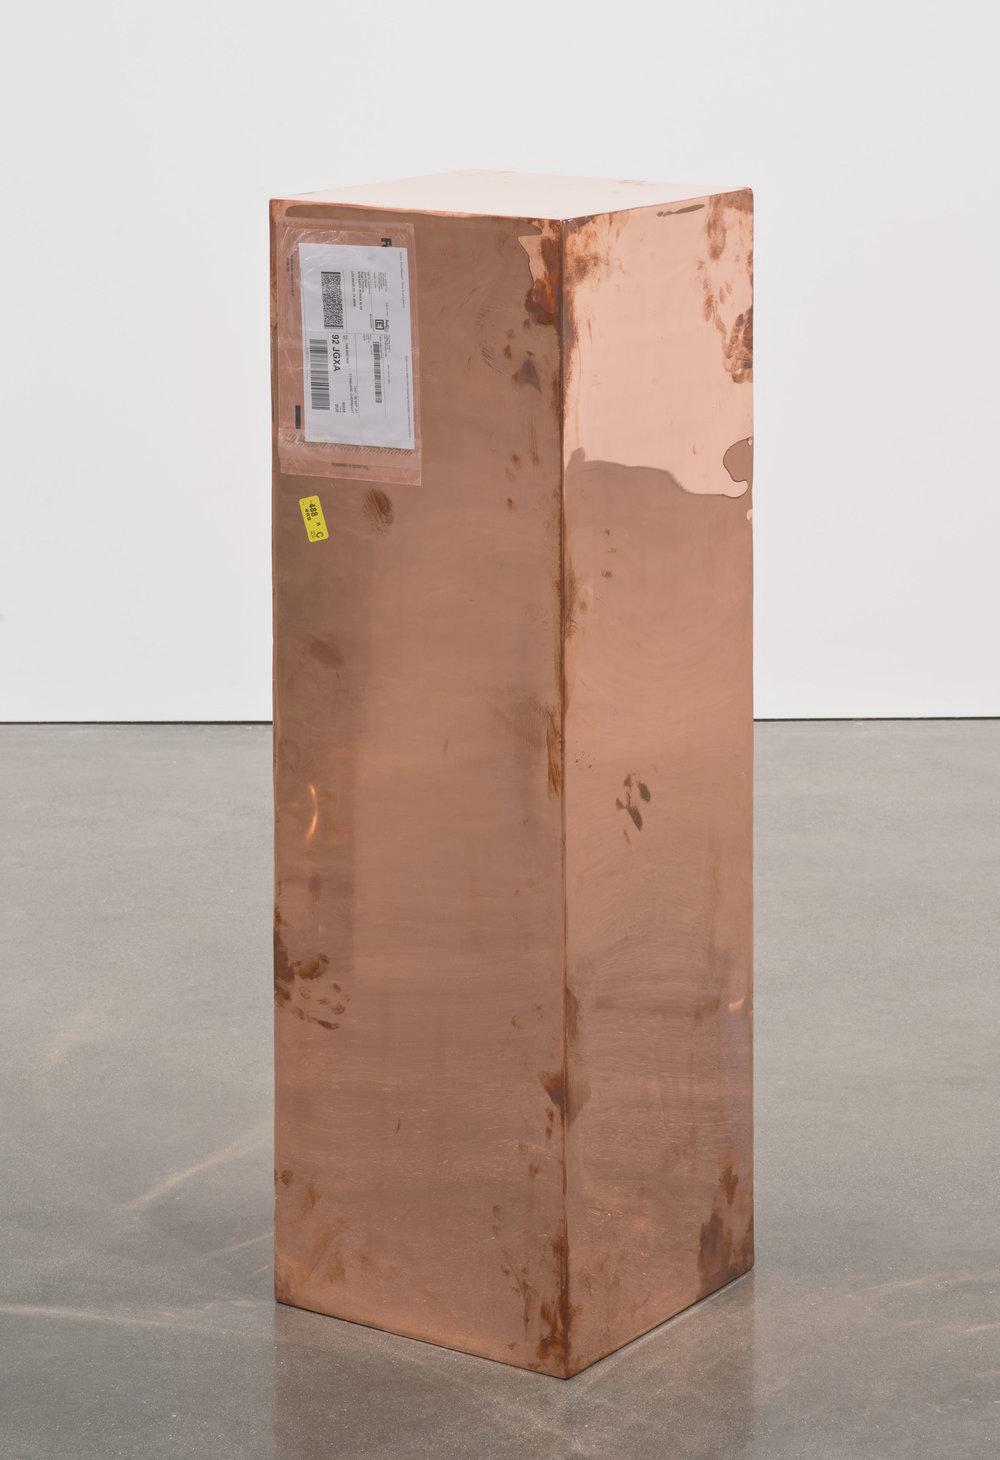 Copper (Fedex® Golf-Bag Box  © 2010 FedEx 163166 REV 10/10) Standard Overnight, Glendale–Los Angeles trk#798886320028, September 5–6, 2012, Standard Overnight, Los Angeles–Miami Beach trk#800983717784, December 1–3, 2012   2012–  Polished copper, accrued FedEx shipping and tracking labels  48 x 15 x 15 inches   FedEx Copper Works, 2009–